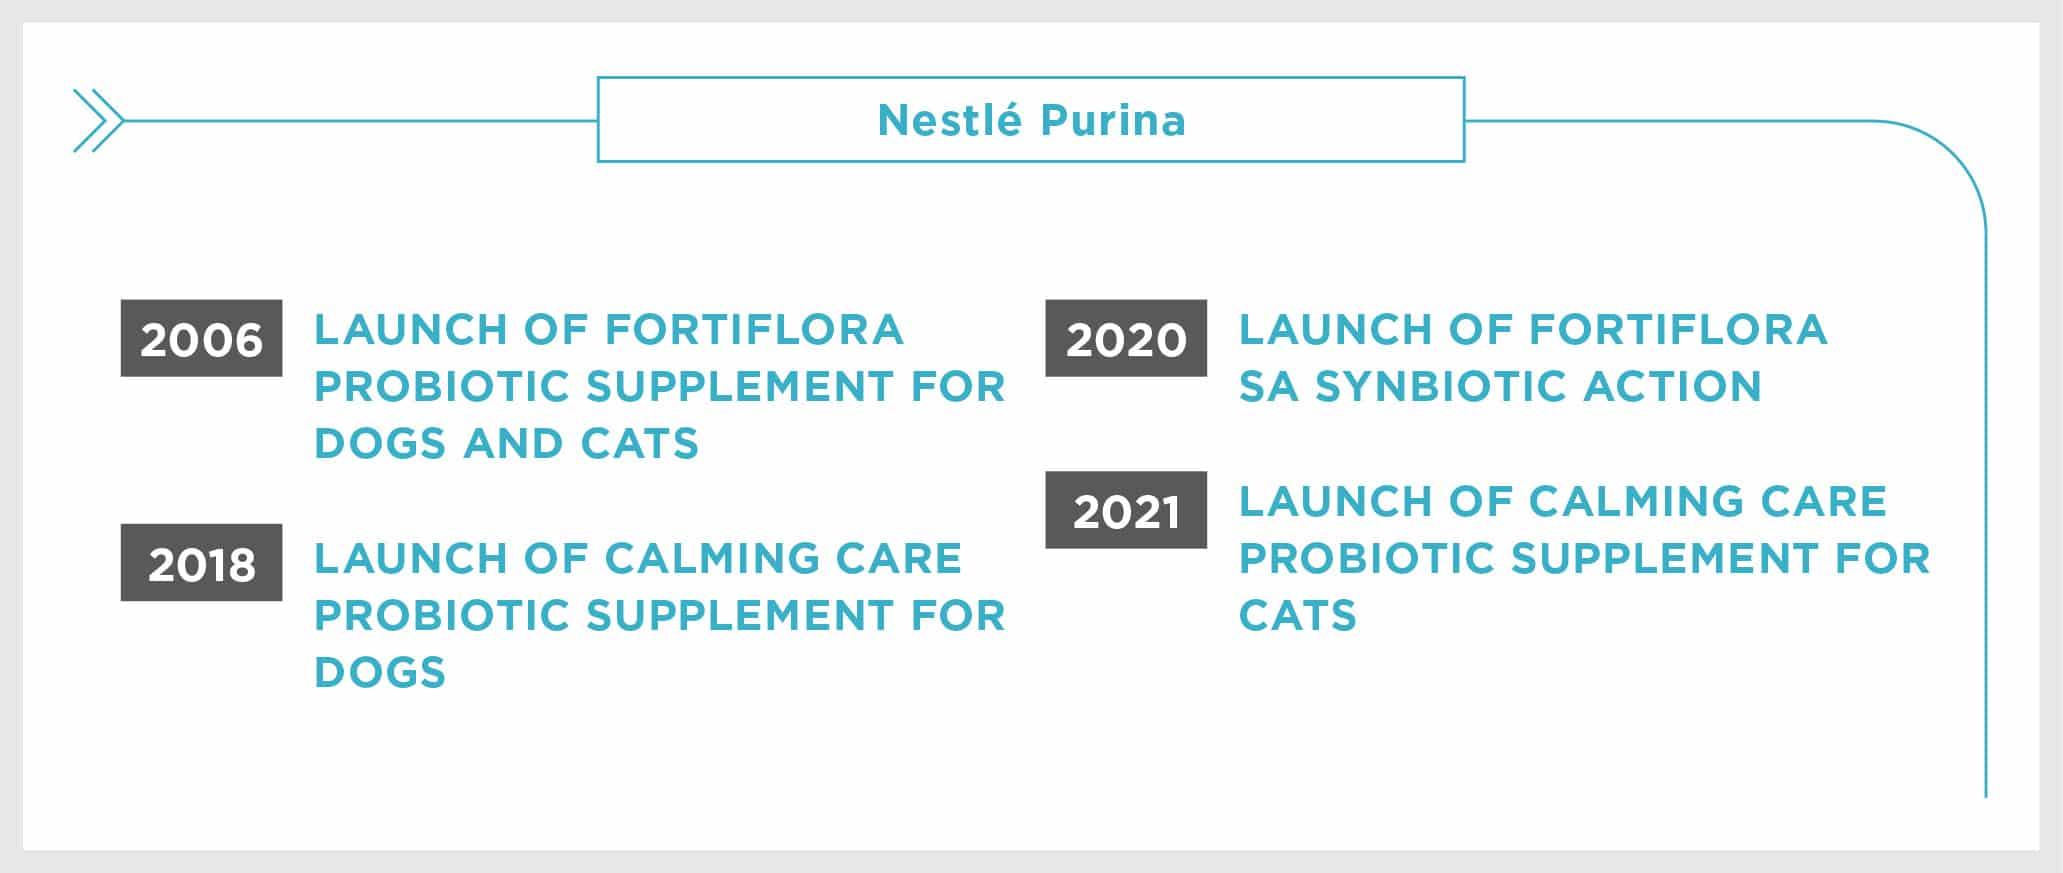 Vision Statement: Nestlé Purina